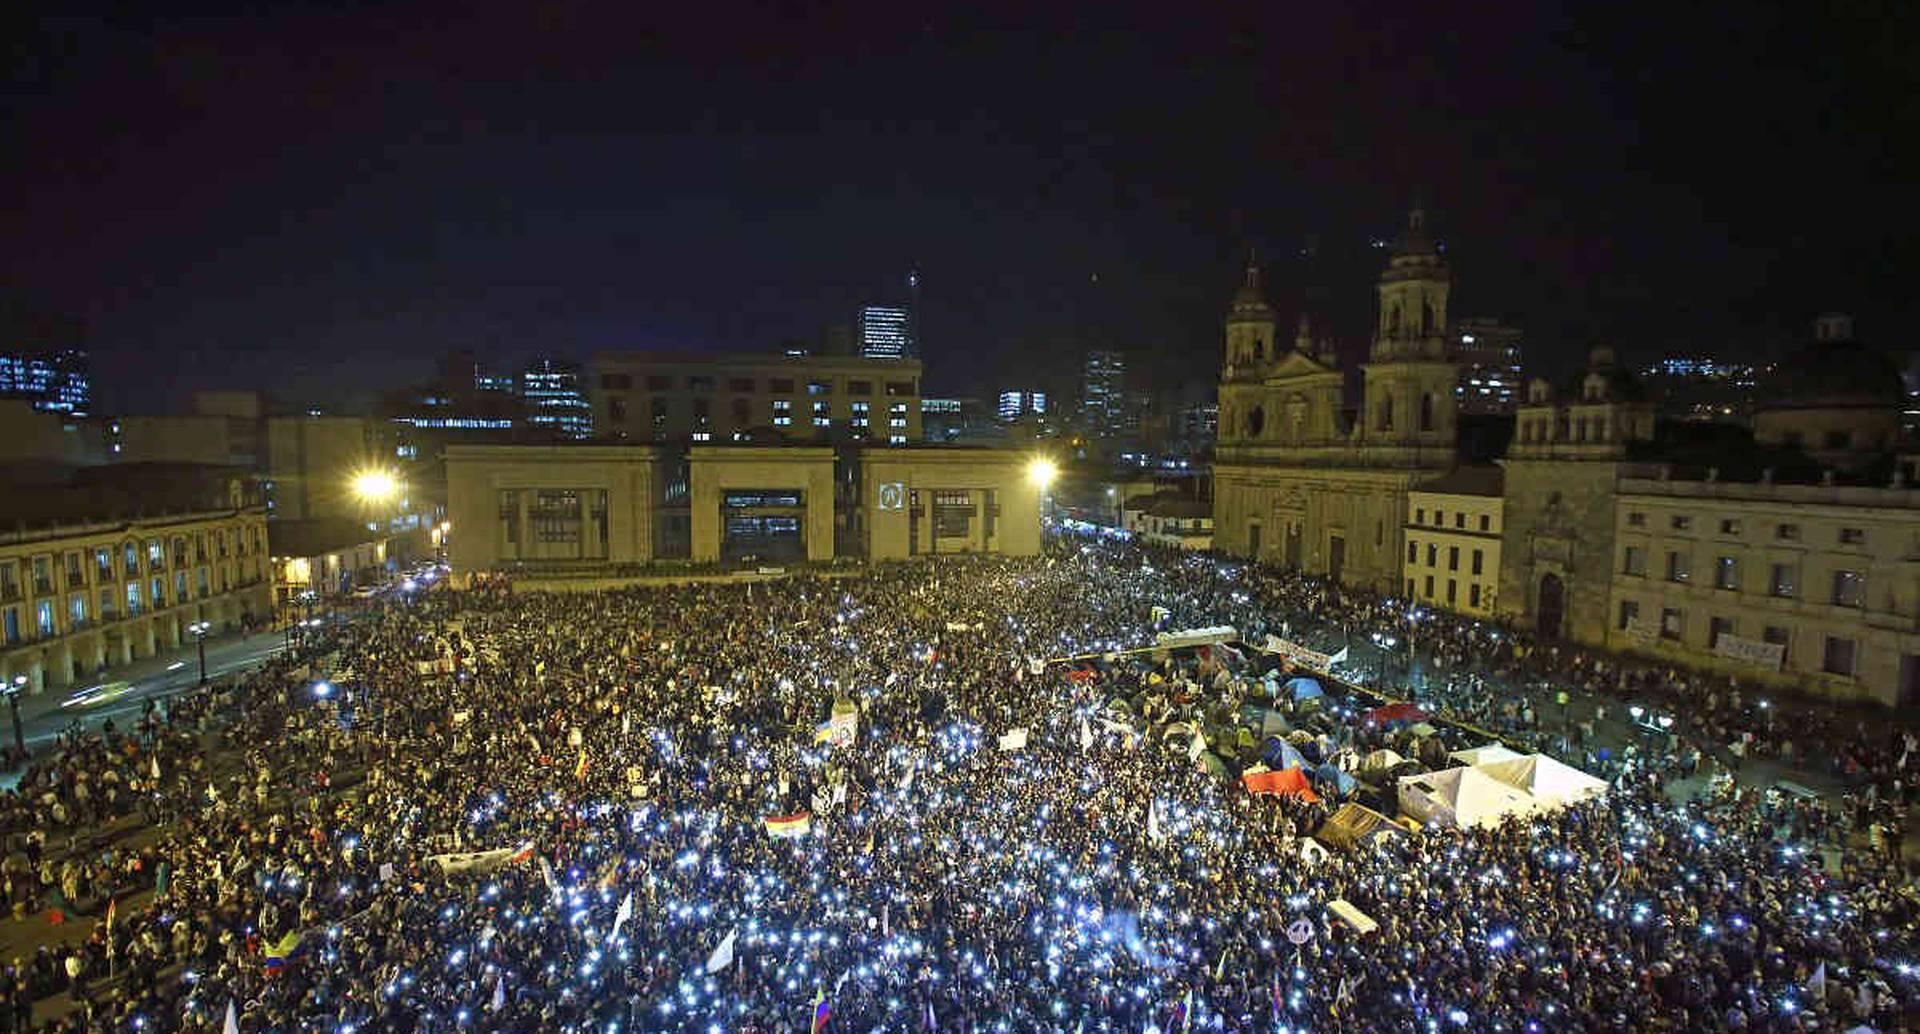 Marcha de los indigenas y estudiantes por la Paz. Marcha a favor de la Paz, Plaza de Bolivar. Bogota 12 Octubre 2016. Foto: Daniel Reina Romero - Revista Semana